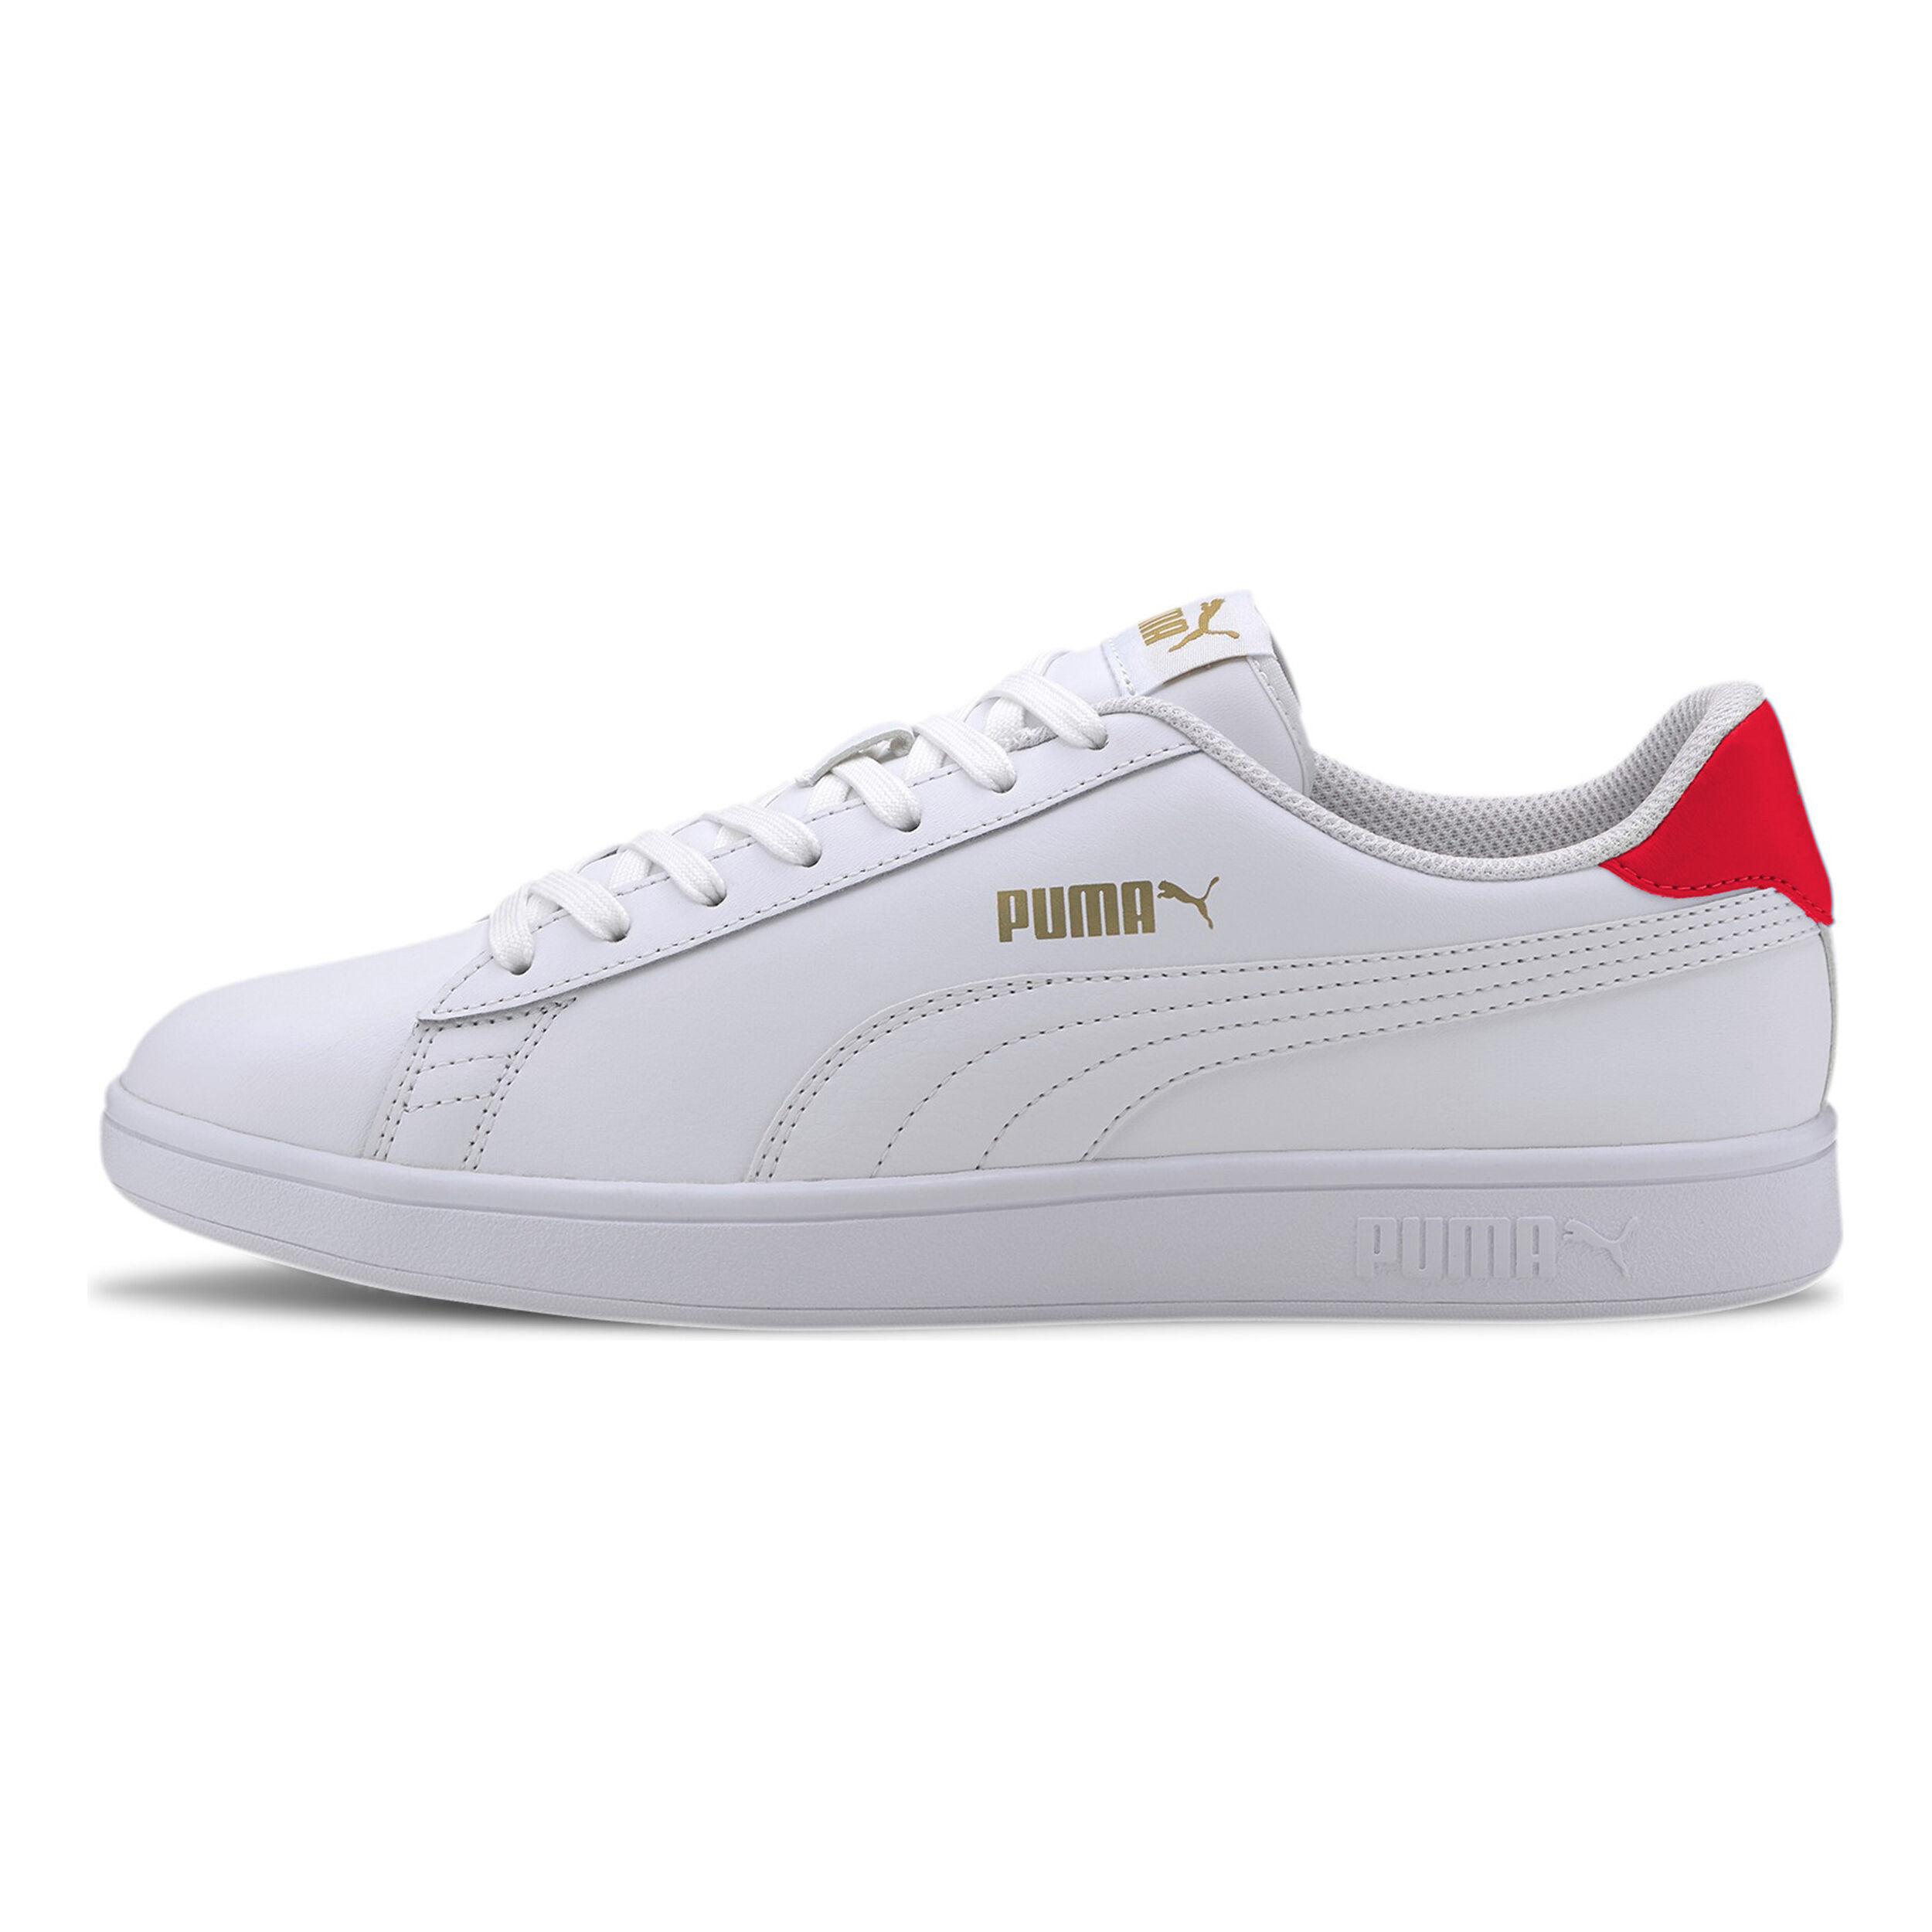 buy Puma Smash V2 Sneakers Men - White, Red online   Jogging-Point